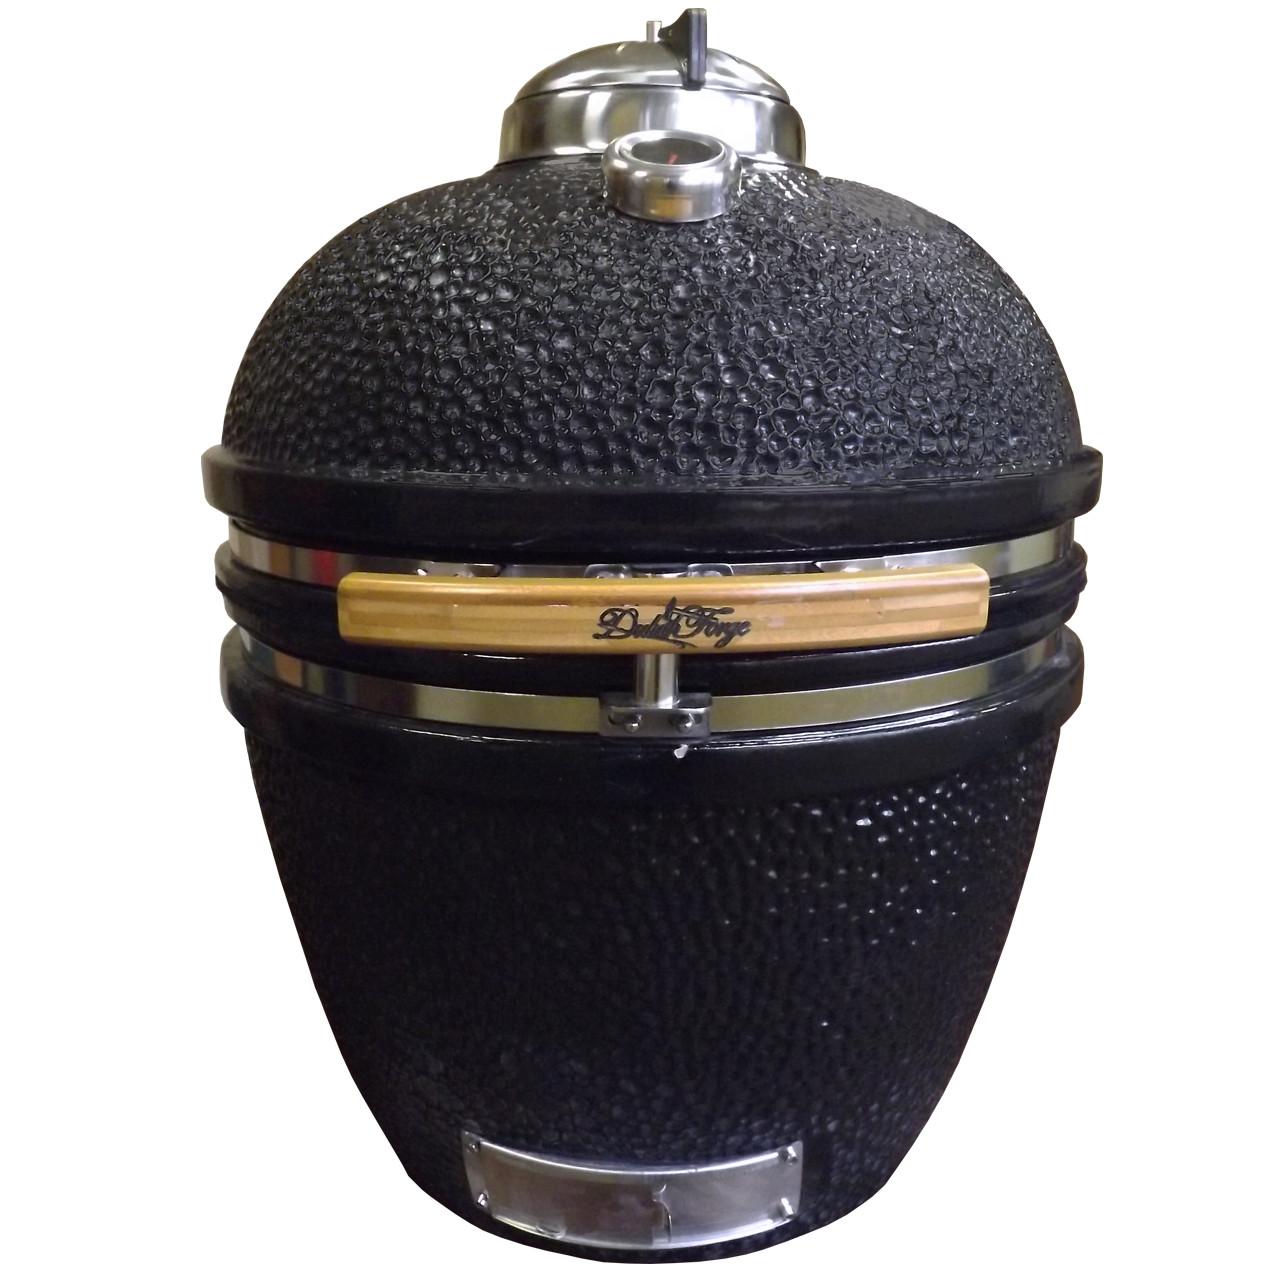 Summers Heat Smoke-N-Sear Pellet Grill and Smoker - Model 51 ...